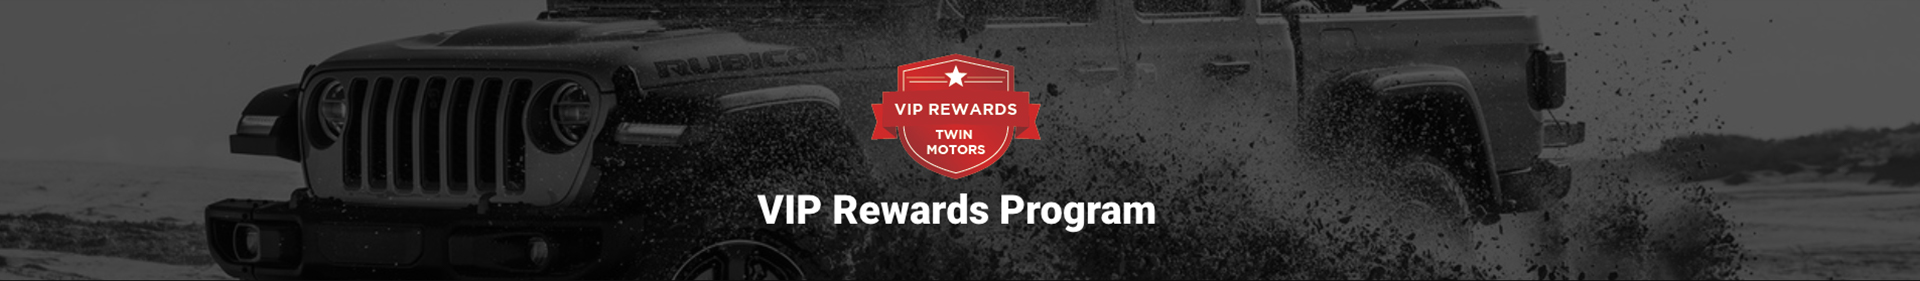 VIP Rewards Featured Image